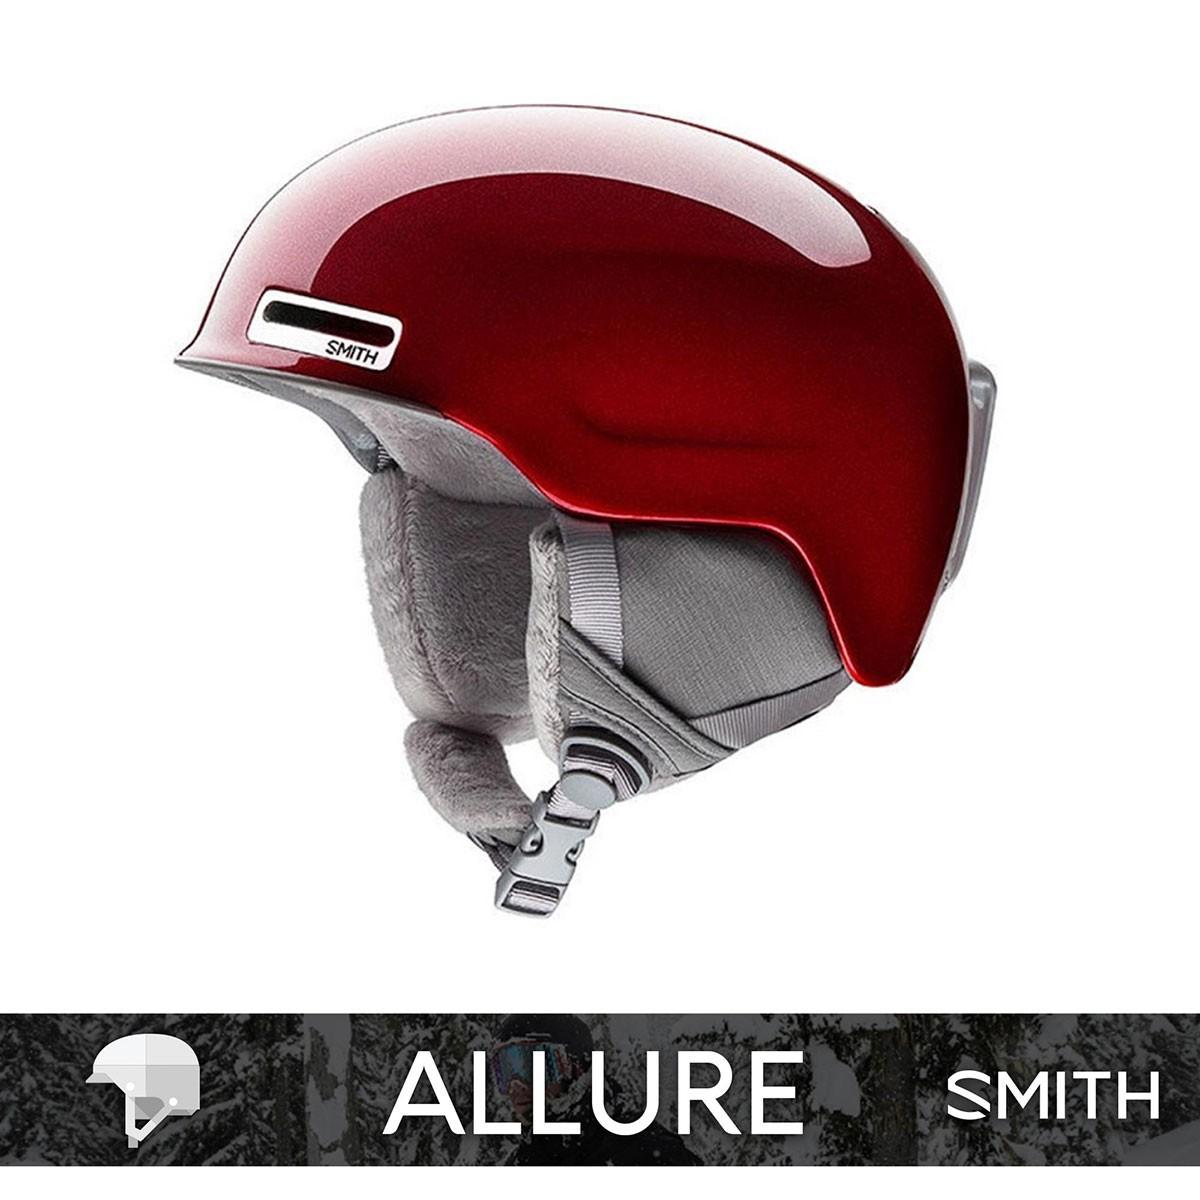 SMITH ALLURE Metallic Pepper - Изображение - AQUAMATRIX